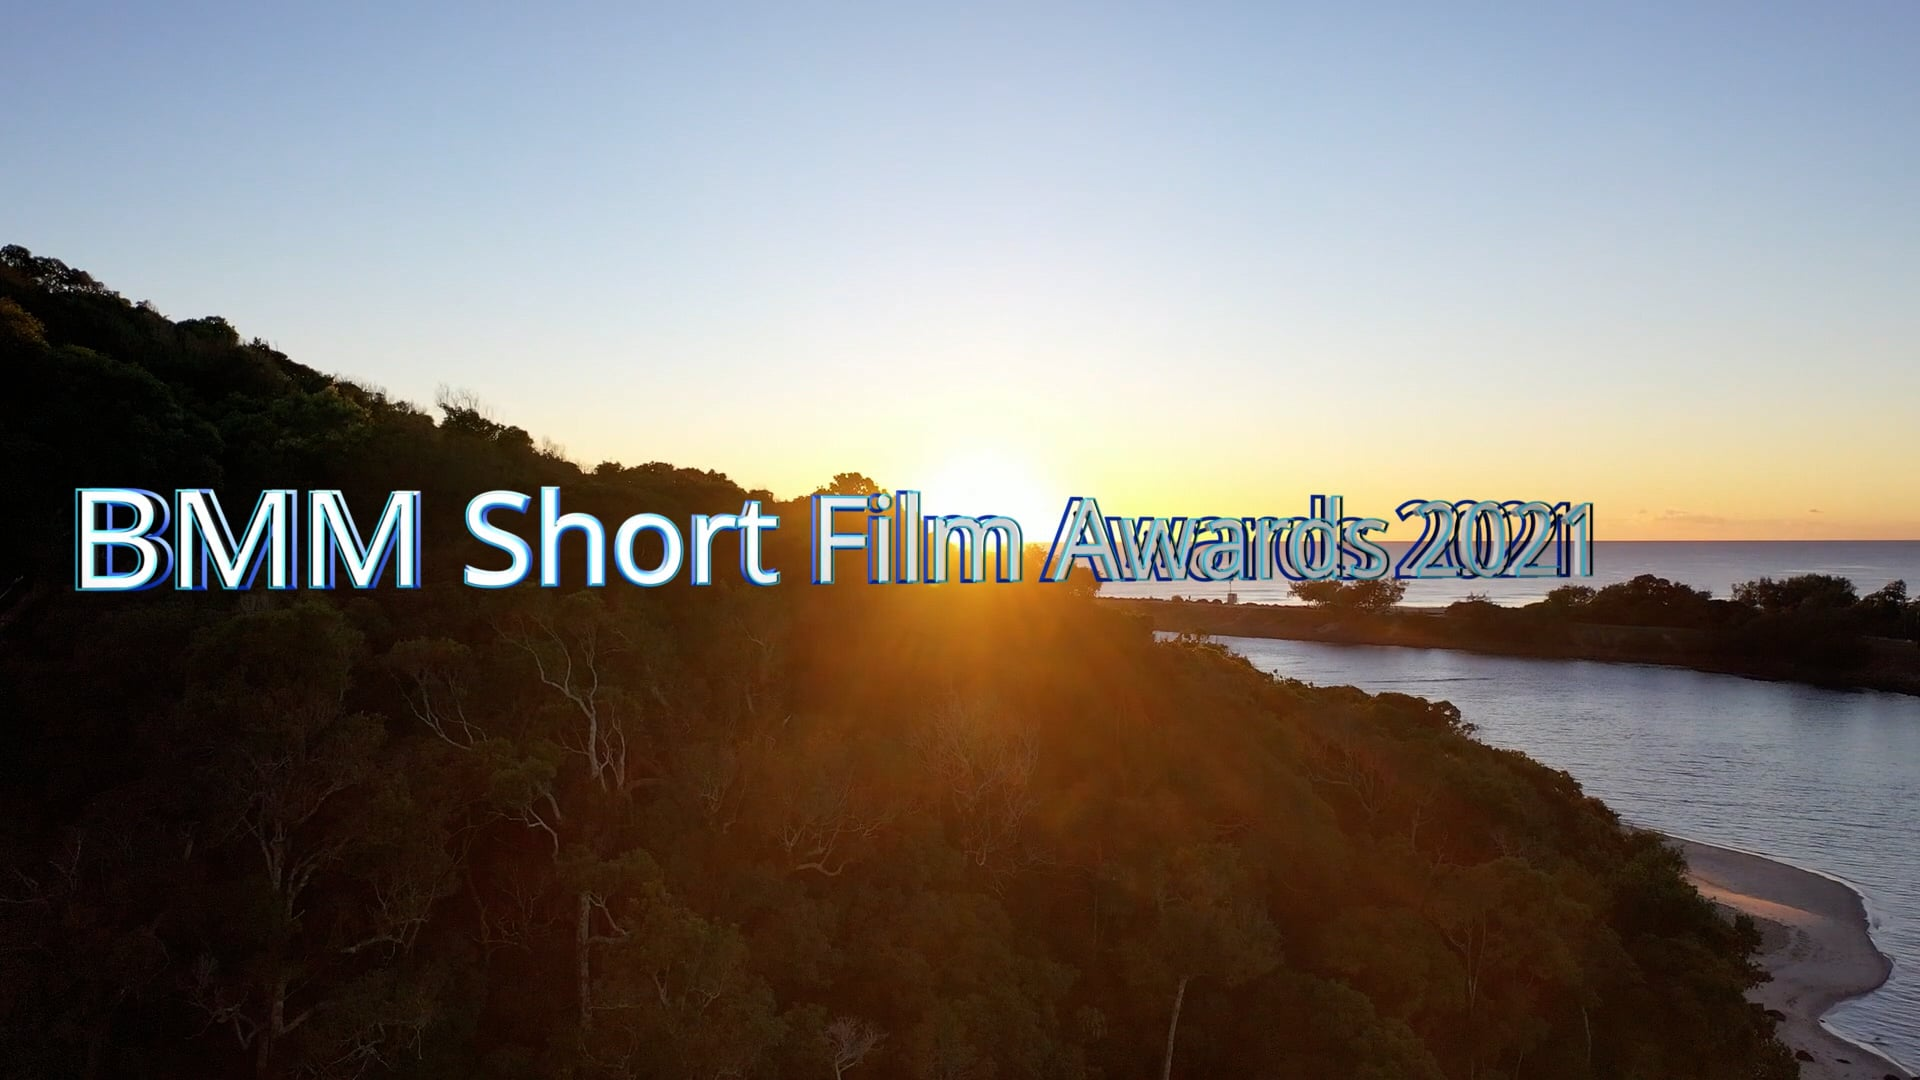 BMM Short Film Awards Trailer